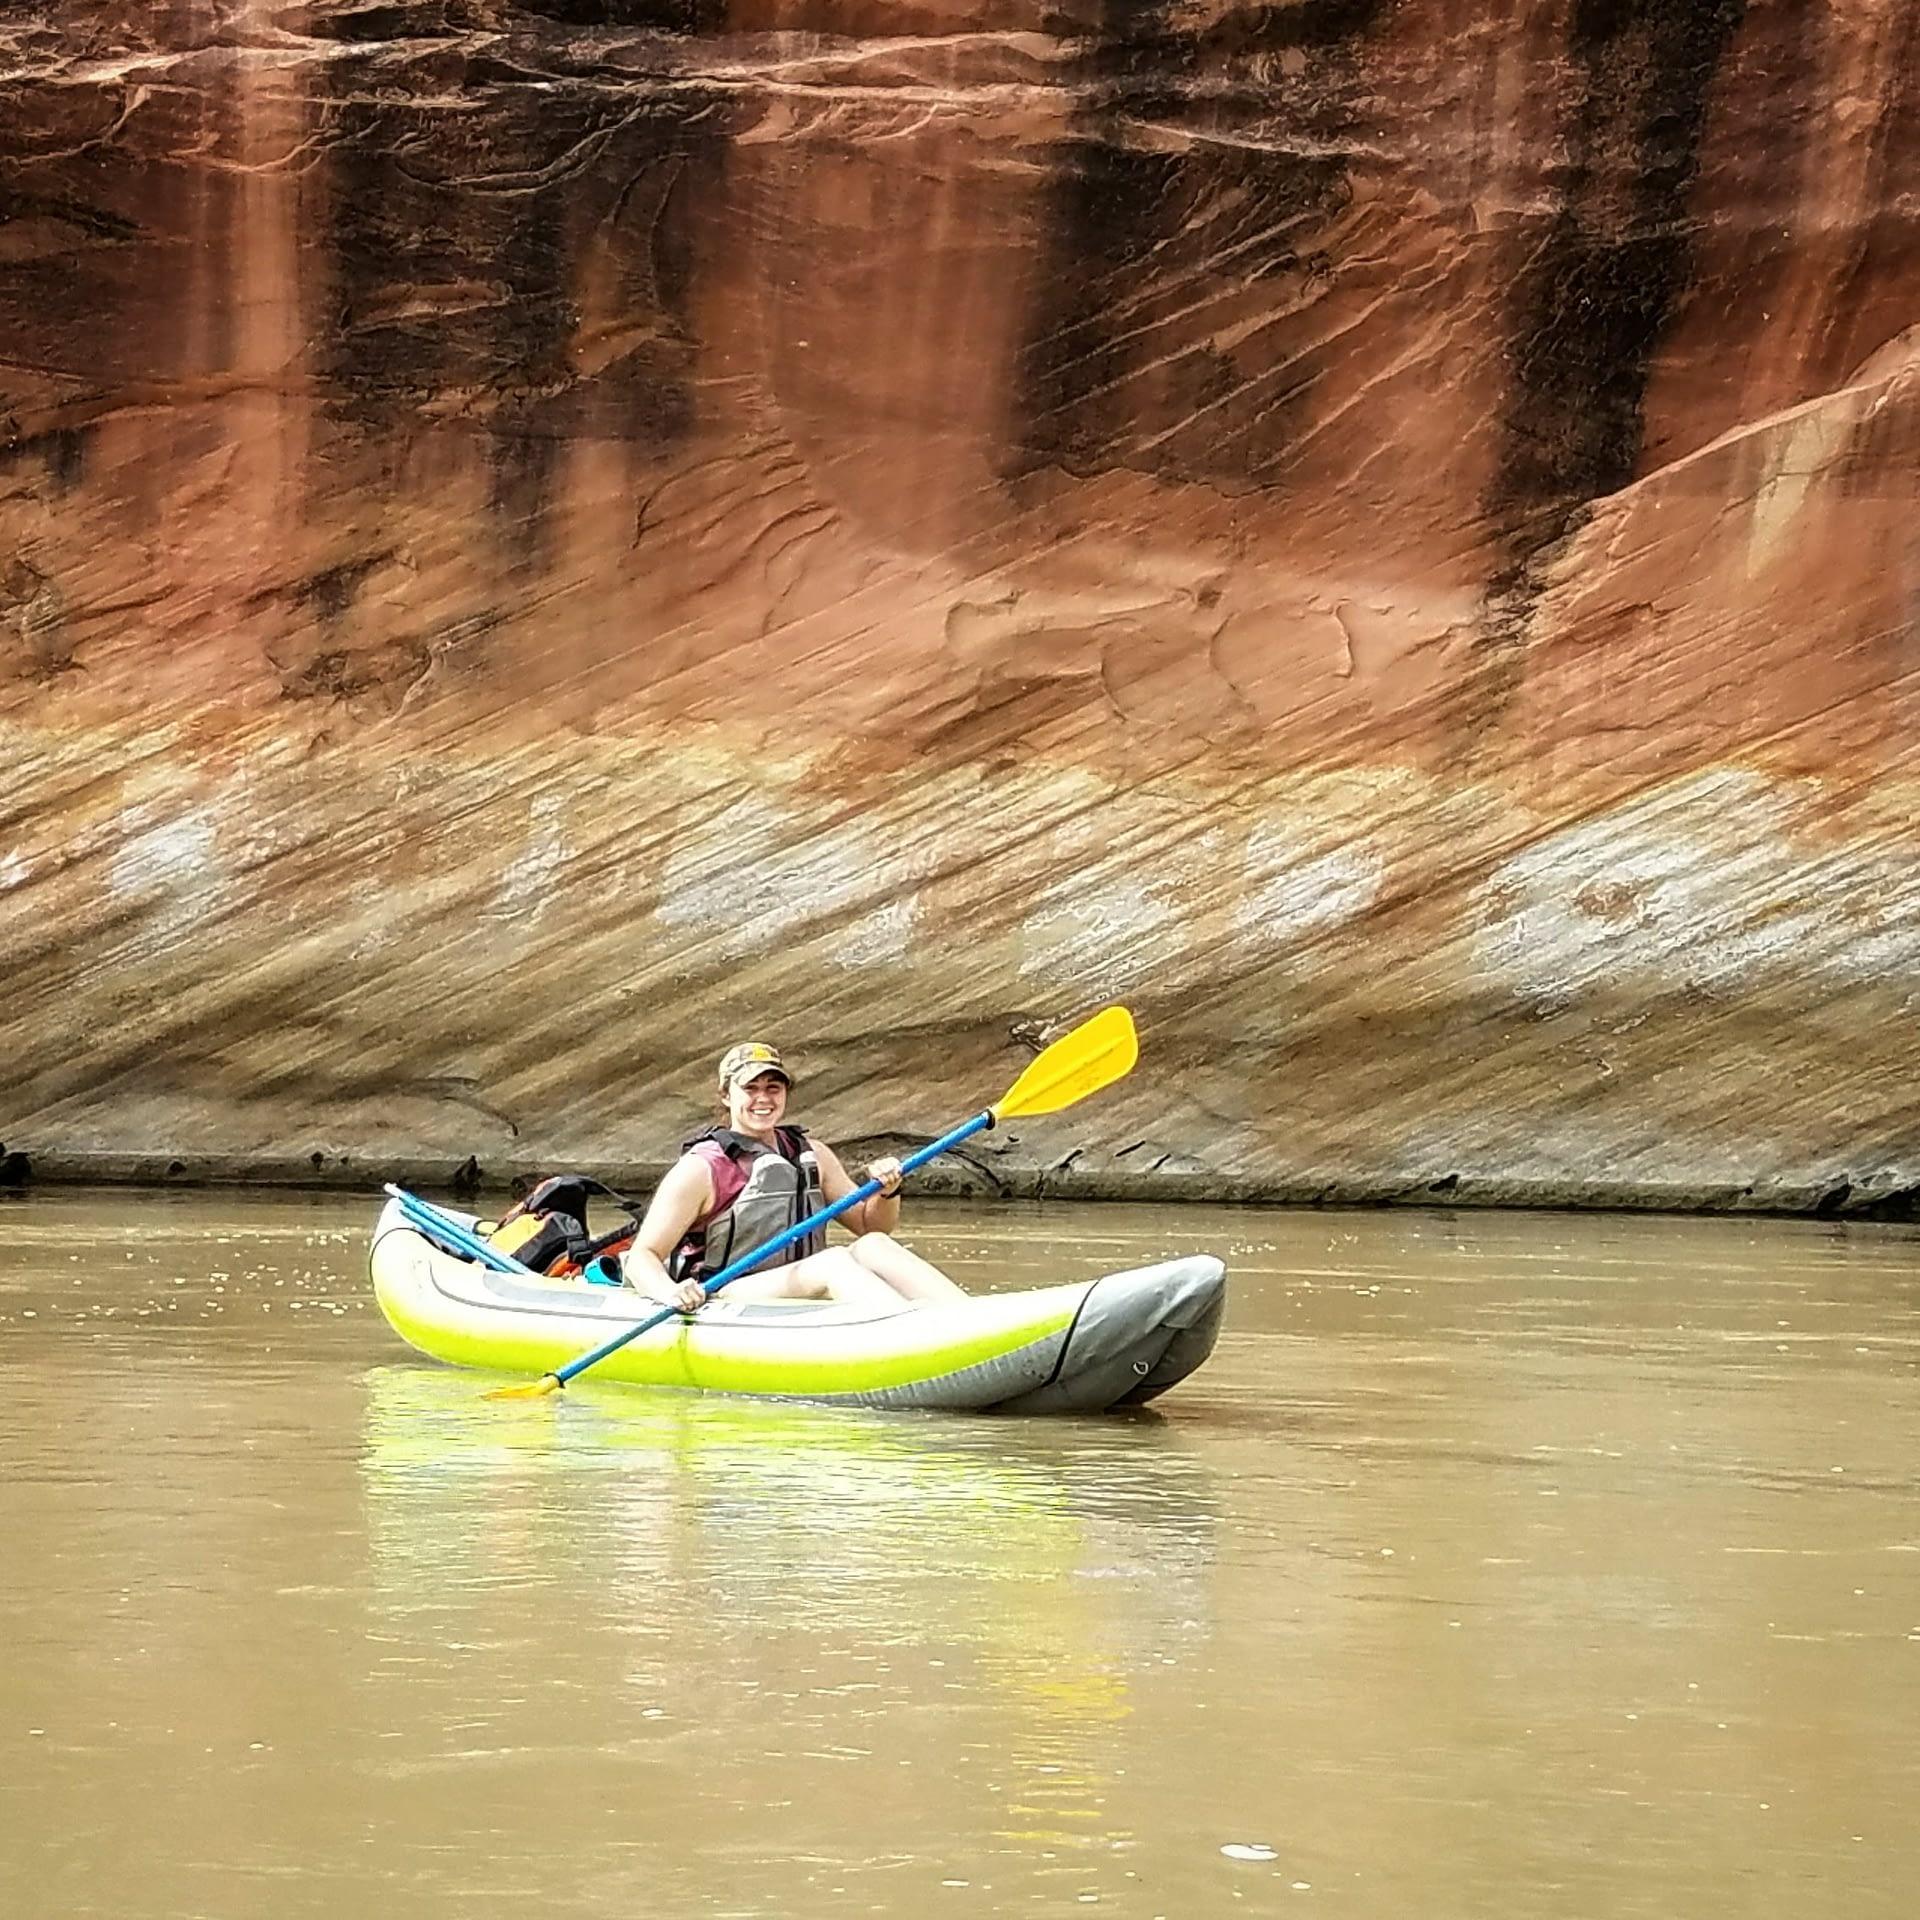 Kayak & Hummer Expedition